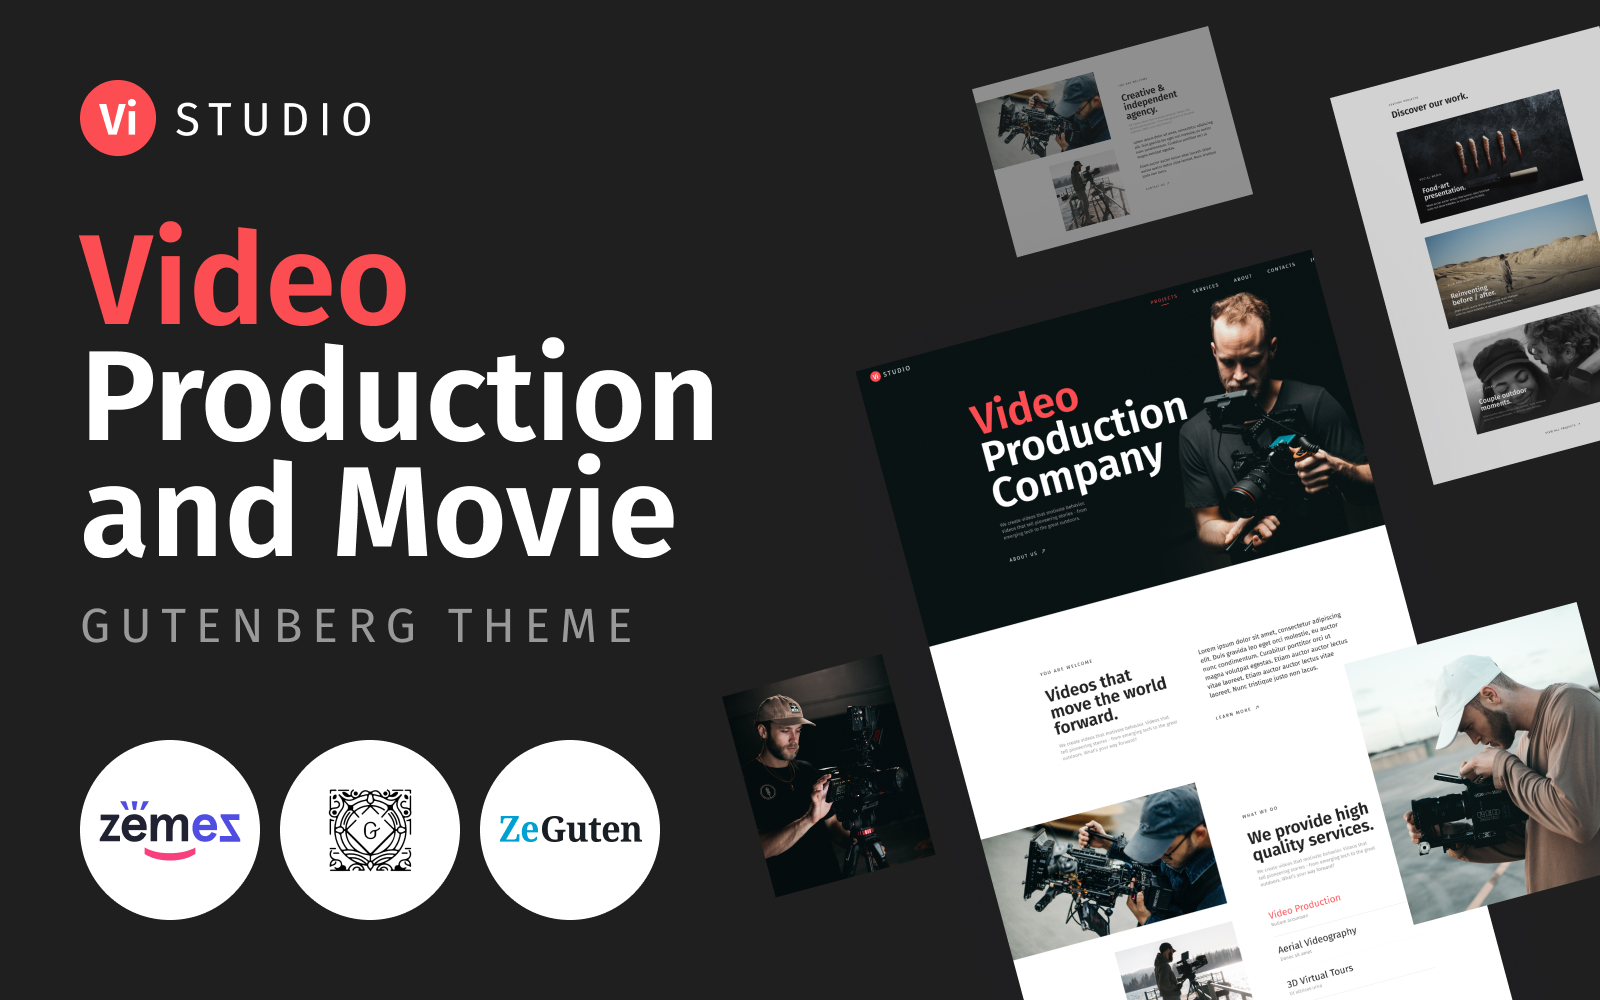 Vistudio - Video Production and Movie WordPress Theme